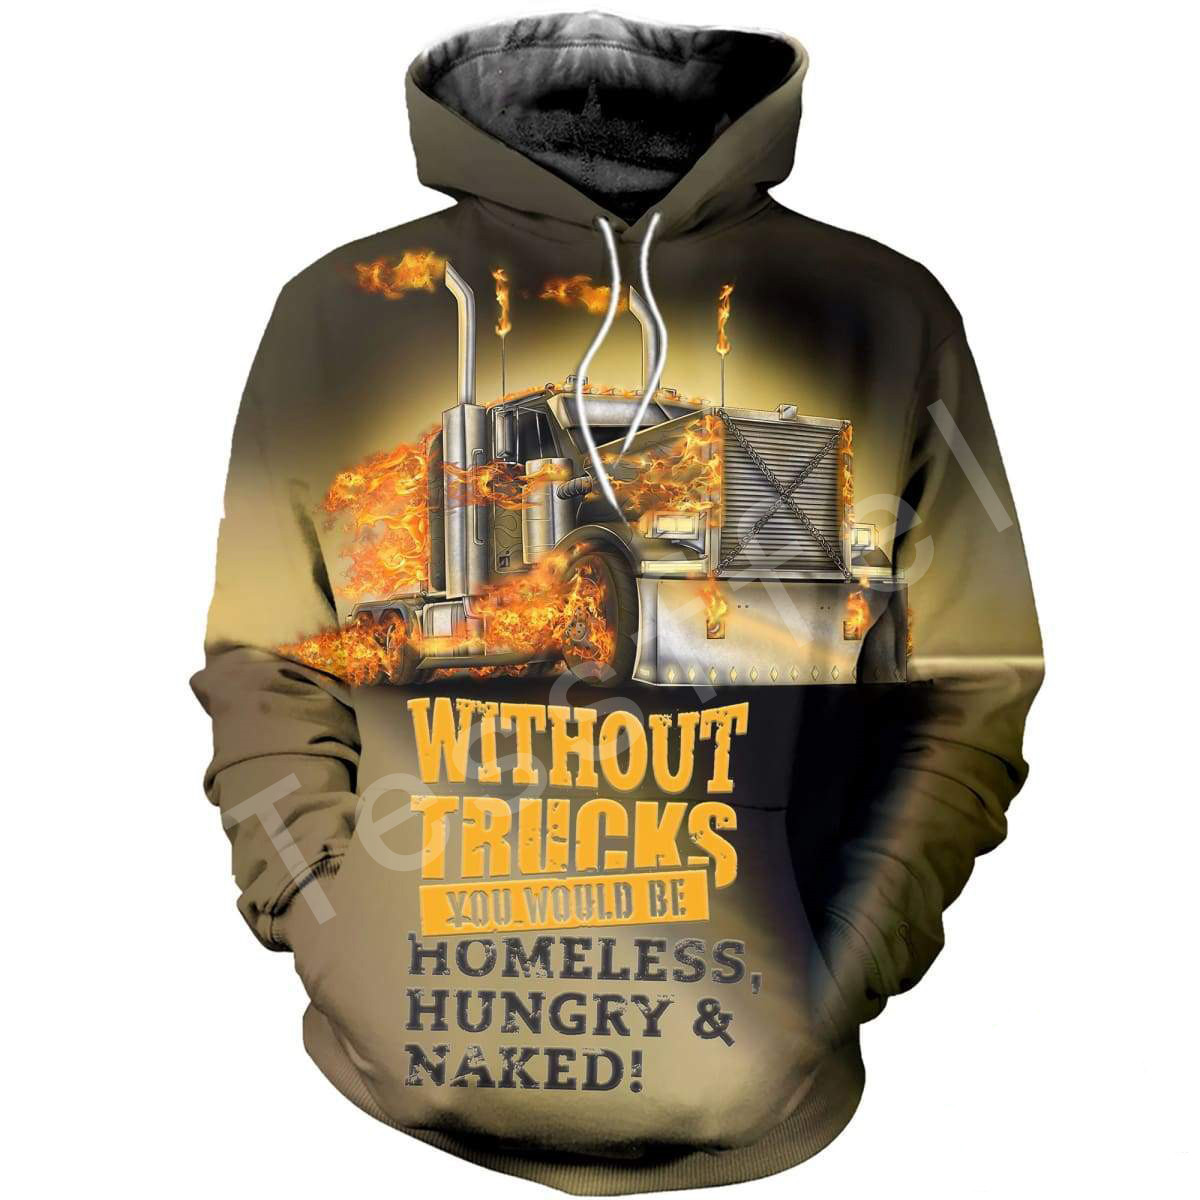 Tessffel KenworthTruck camo 3D full Printed Hoodie Sweatshirt Jacket shirts Mens Womens HIP HOP fit colorful Harajuku style 5 in Hoodies amp Sweatshirts from Men 39 s Clothing